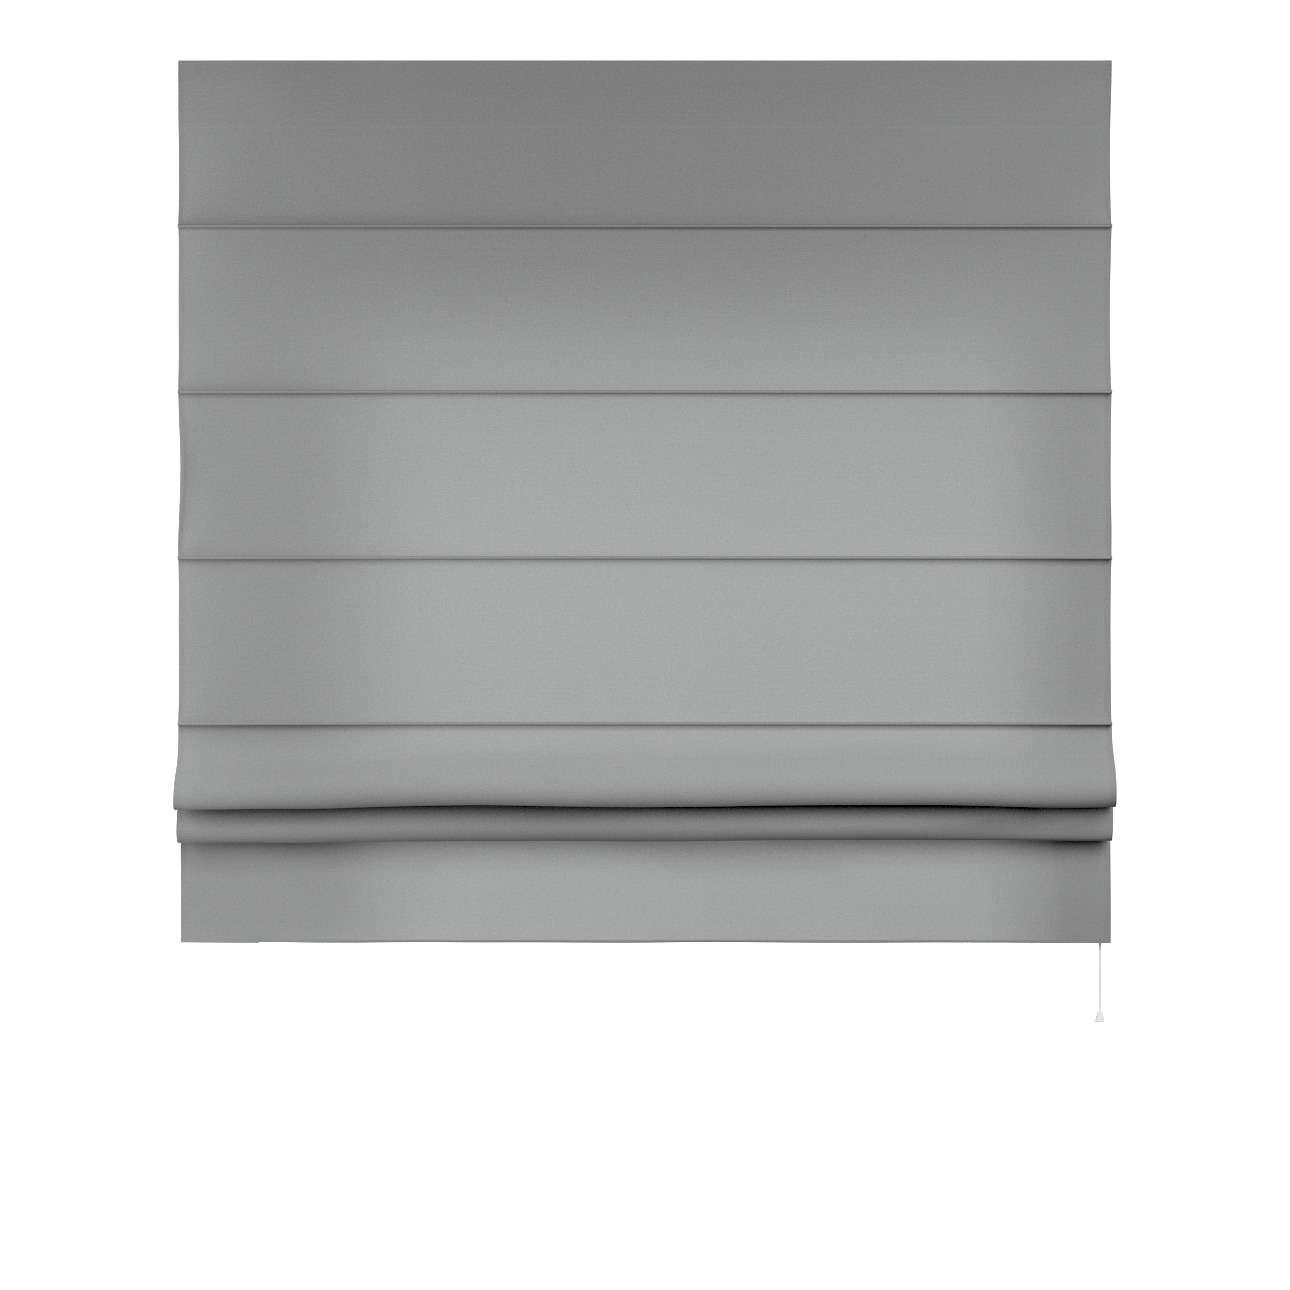 vouwgordijn Padva 80 x 170 cm van de collectie Loneta, Stof: 133-24